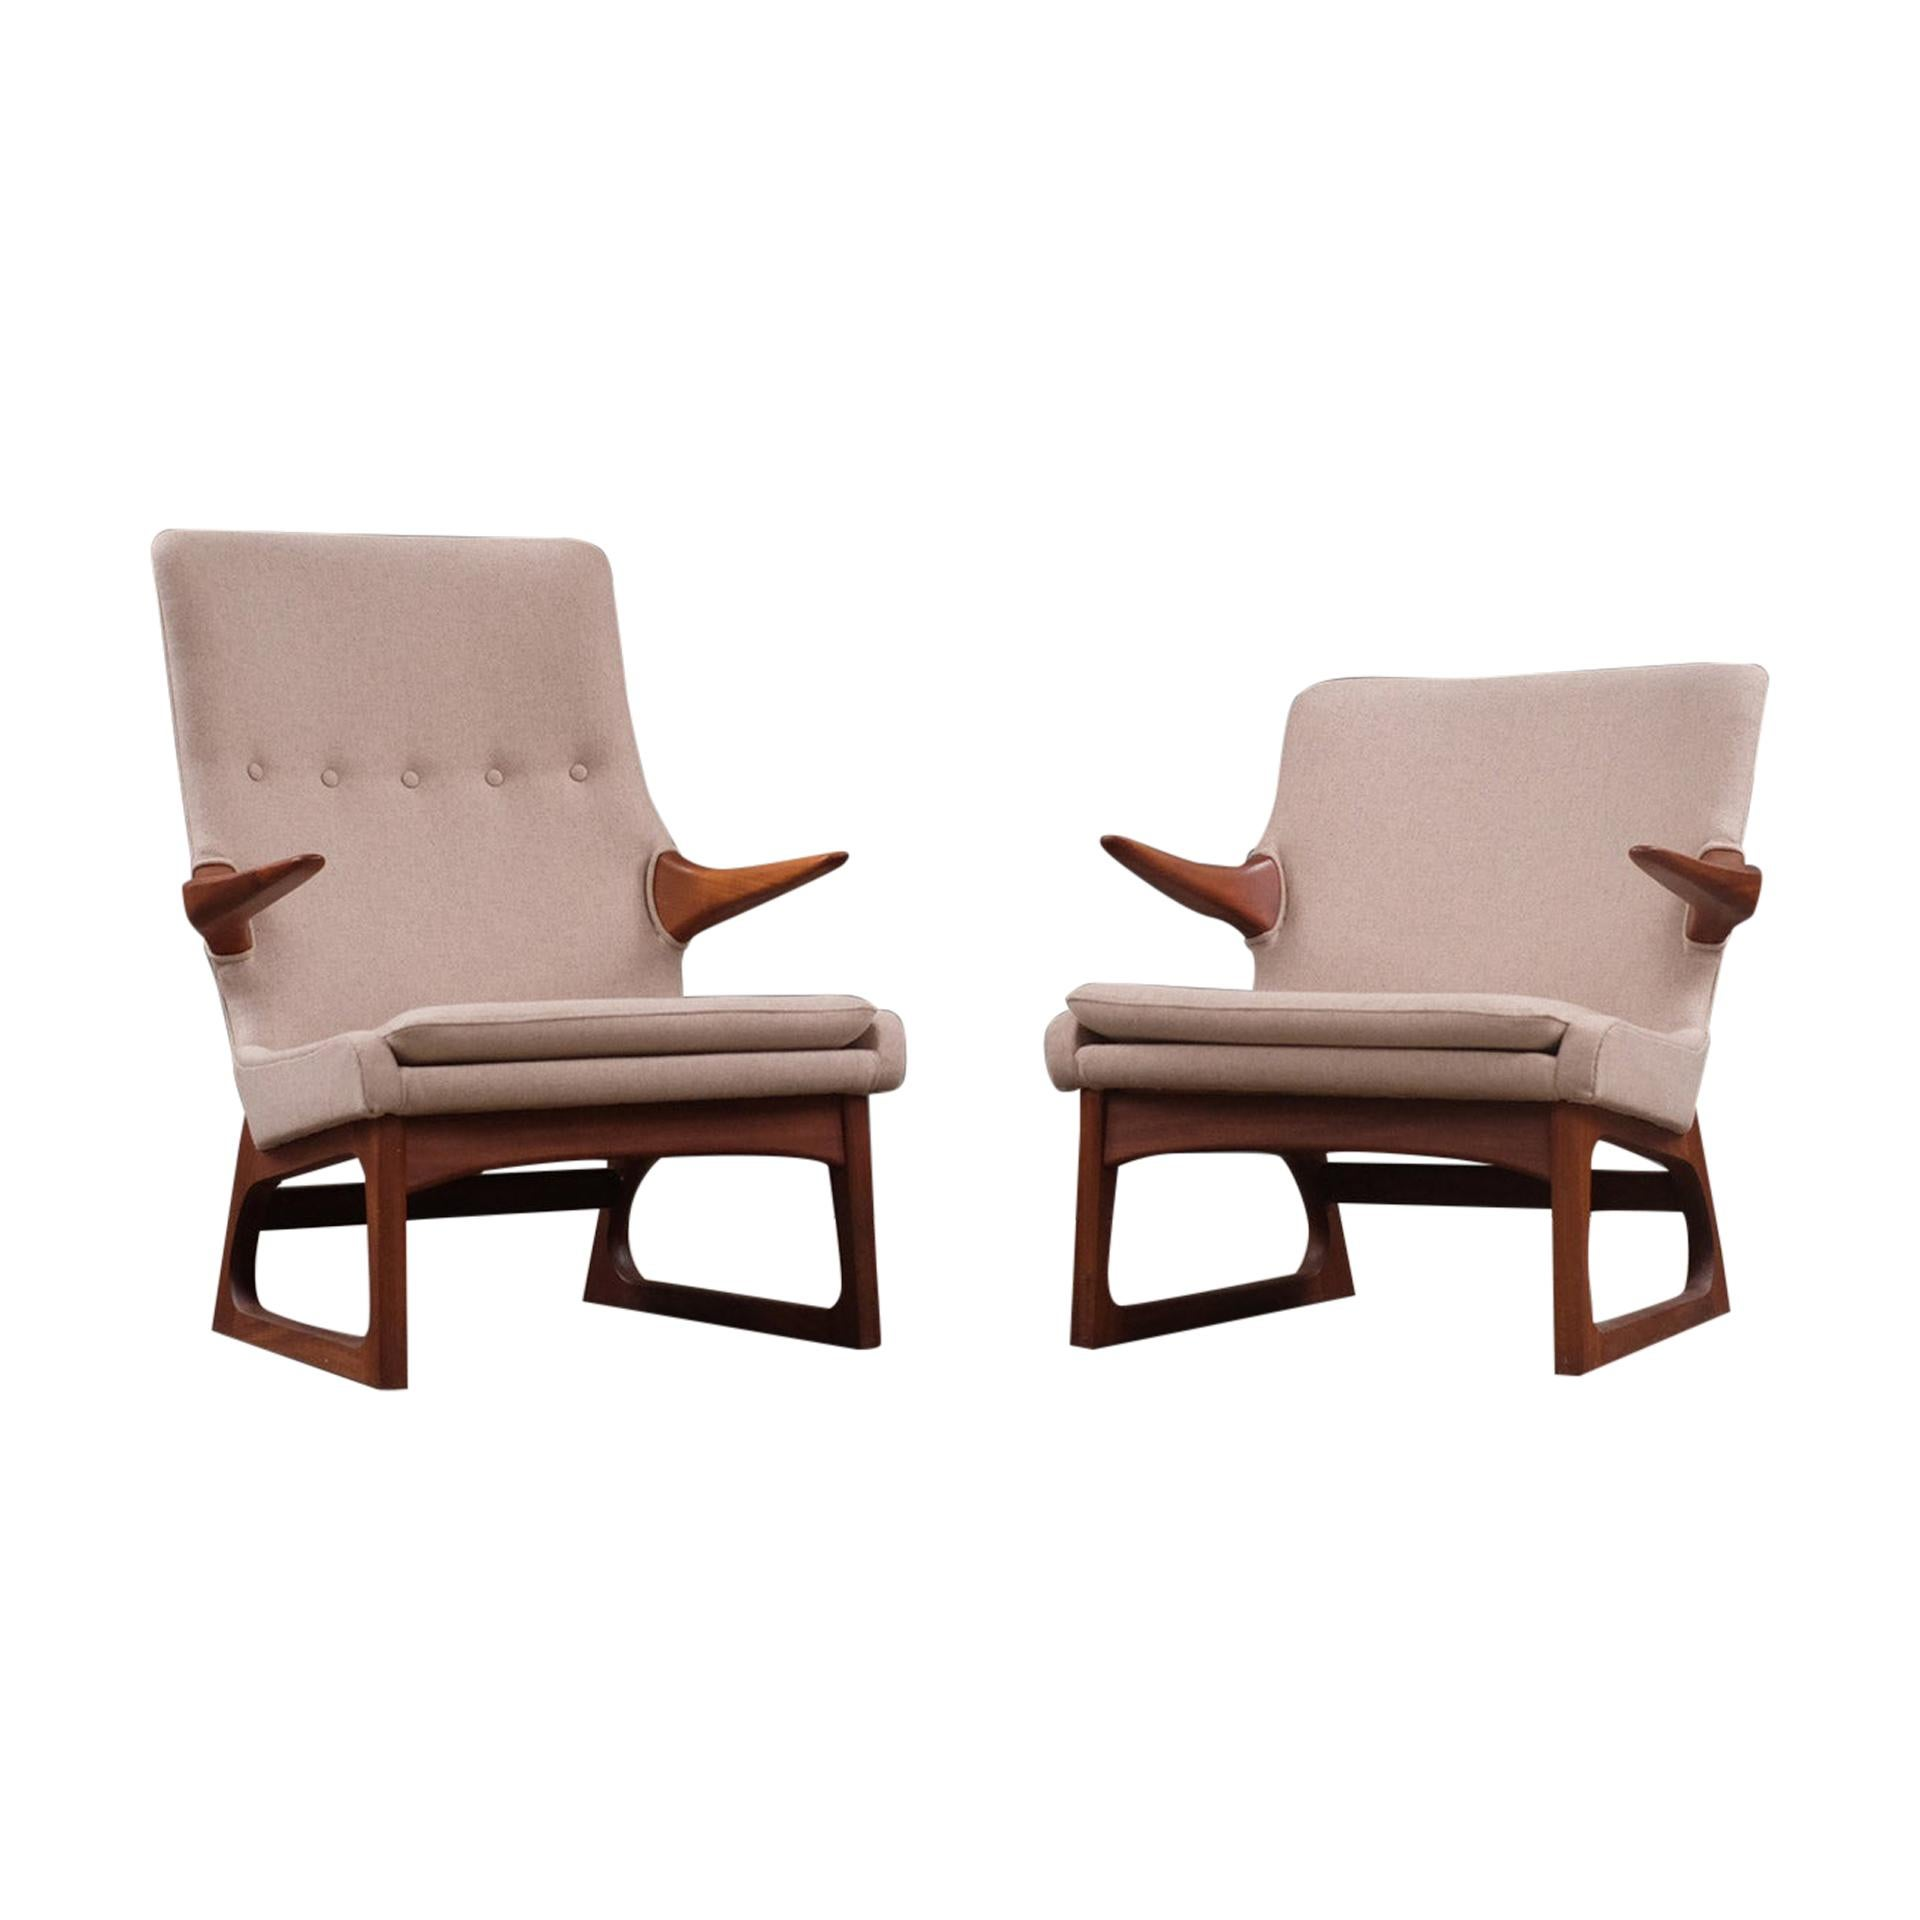 Scandinavian Modern Danish Sculptural Teak Cream Lounge Chairs, Mid 20th Century